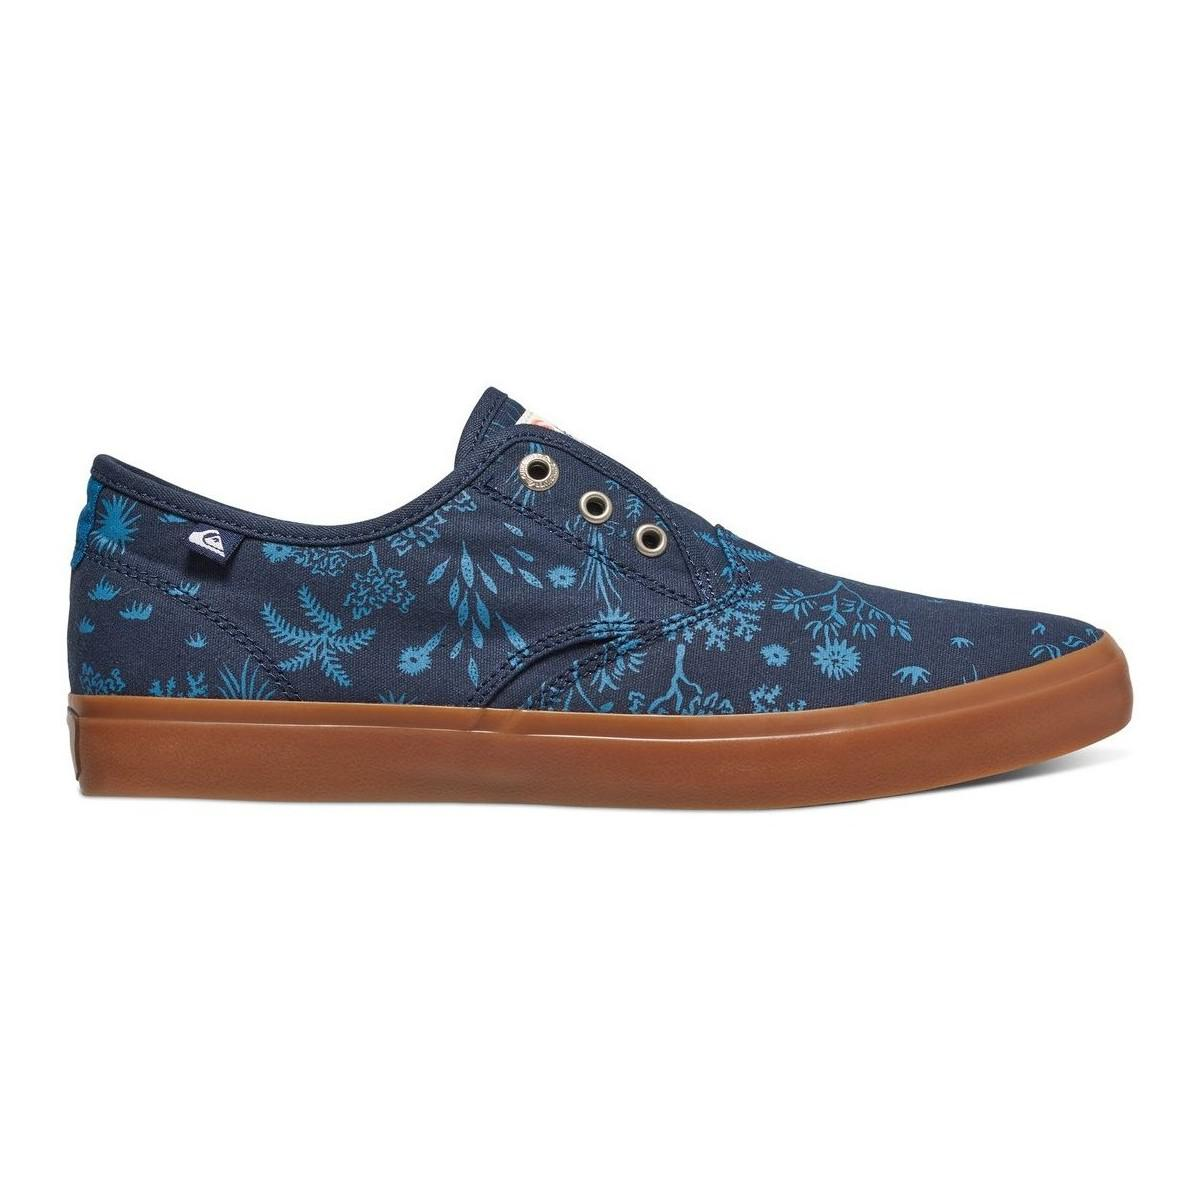 Quiksilver Shorebreak Deluxe - Zapatillas De Media Bota Men s Shoes ... c78d44e91a0